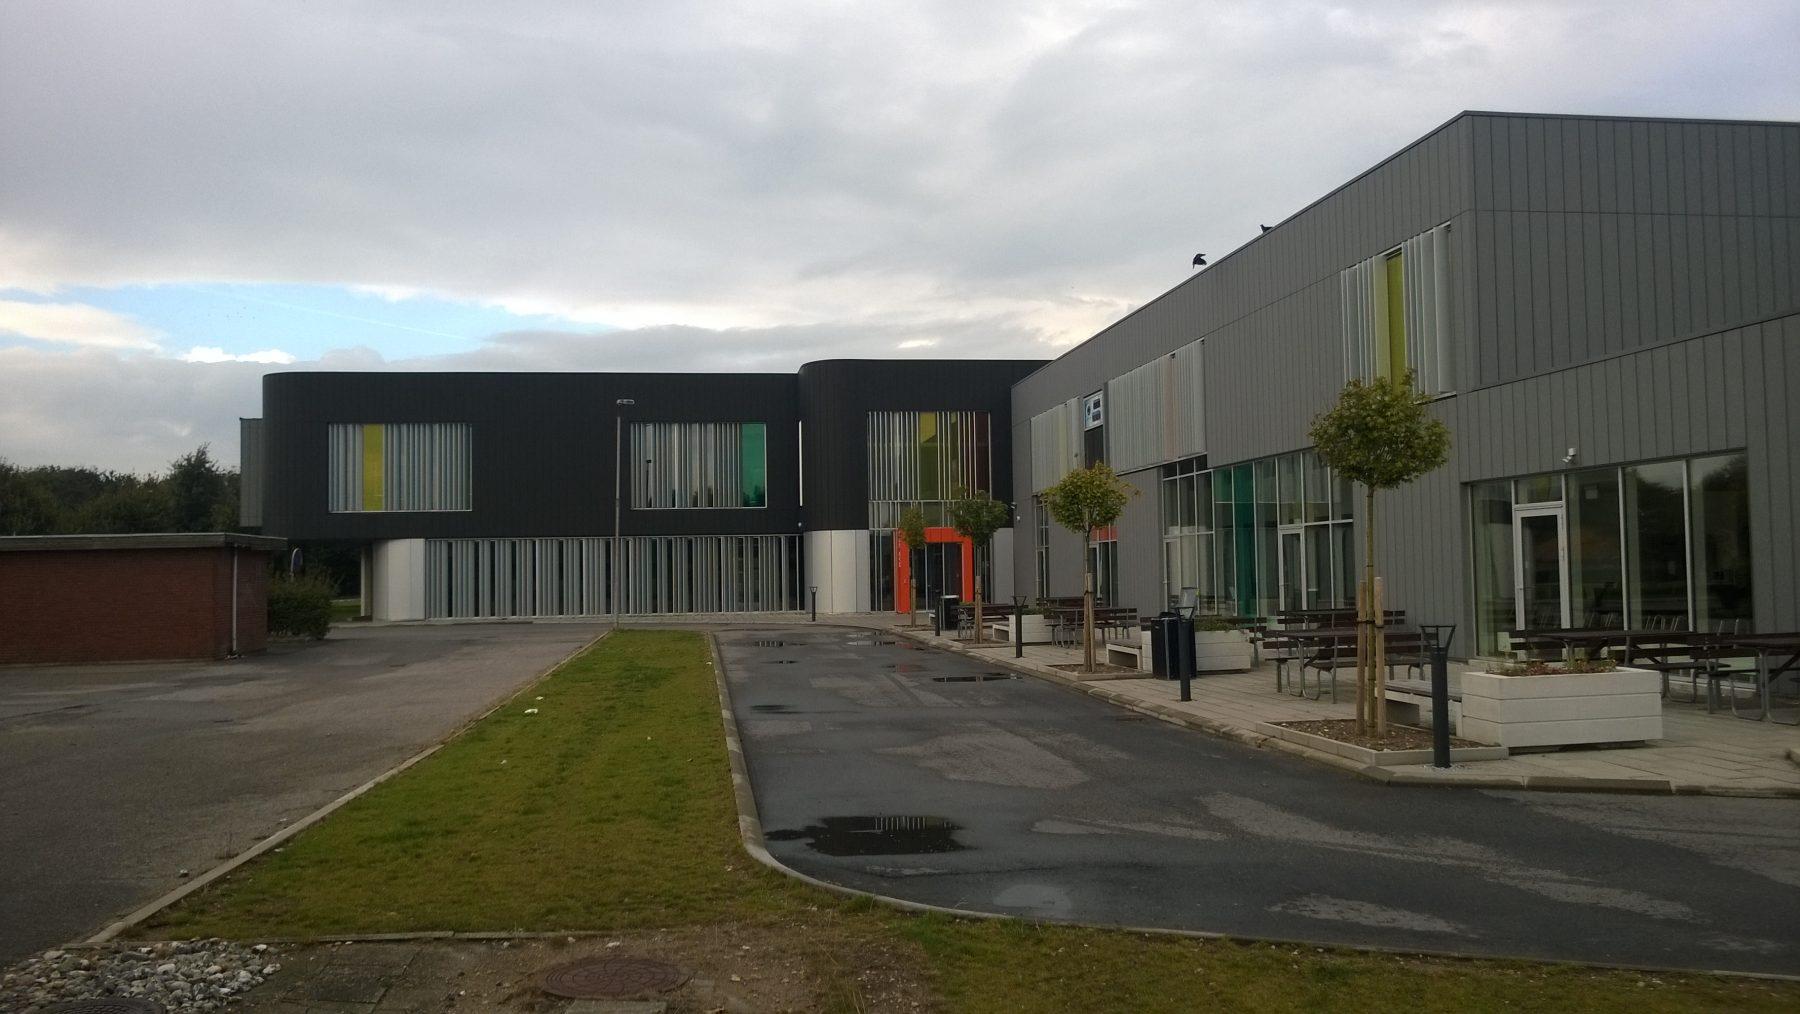 Campus Tønder, Tønder